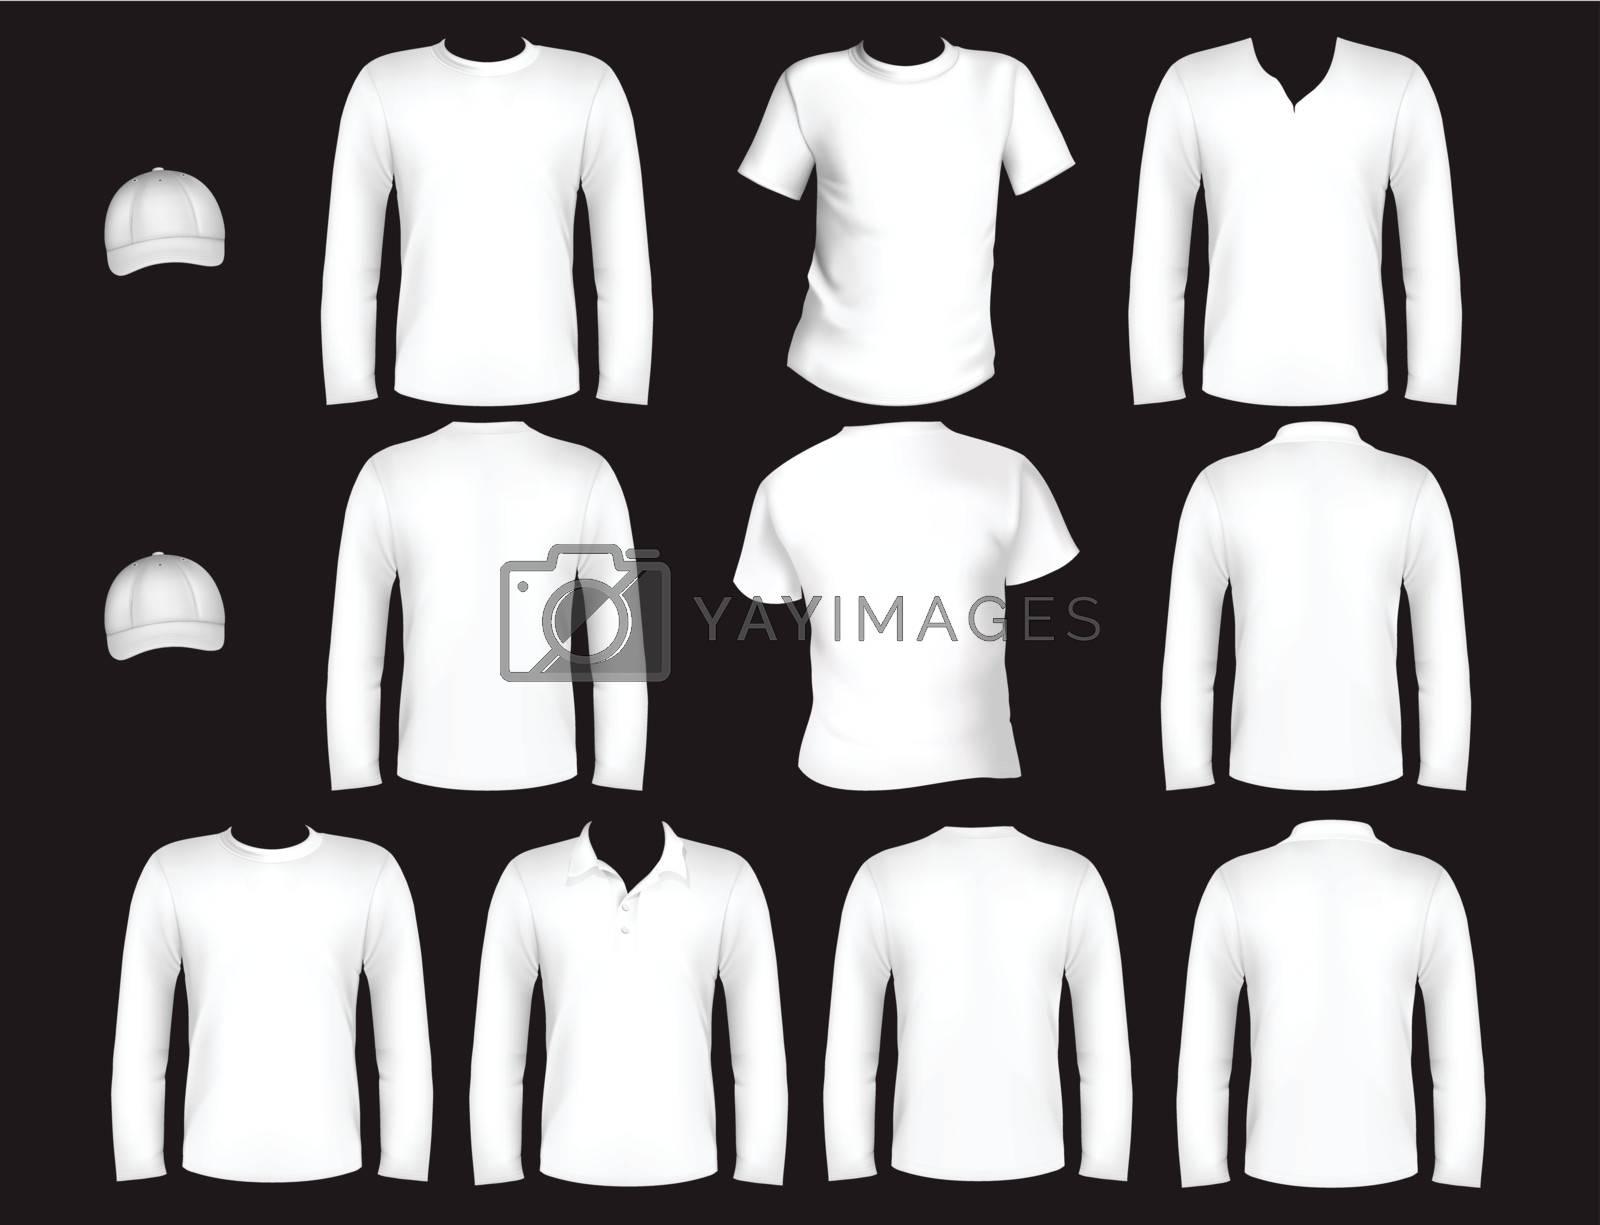 t-shirt design template and cap